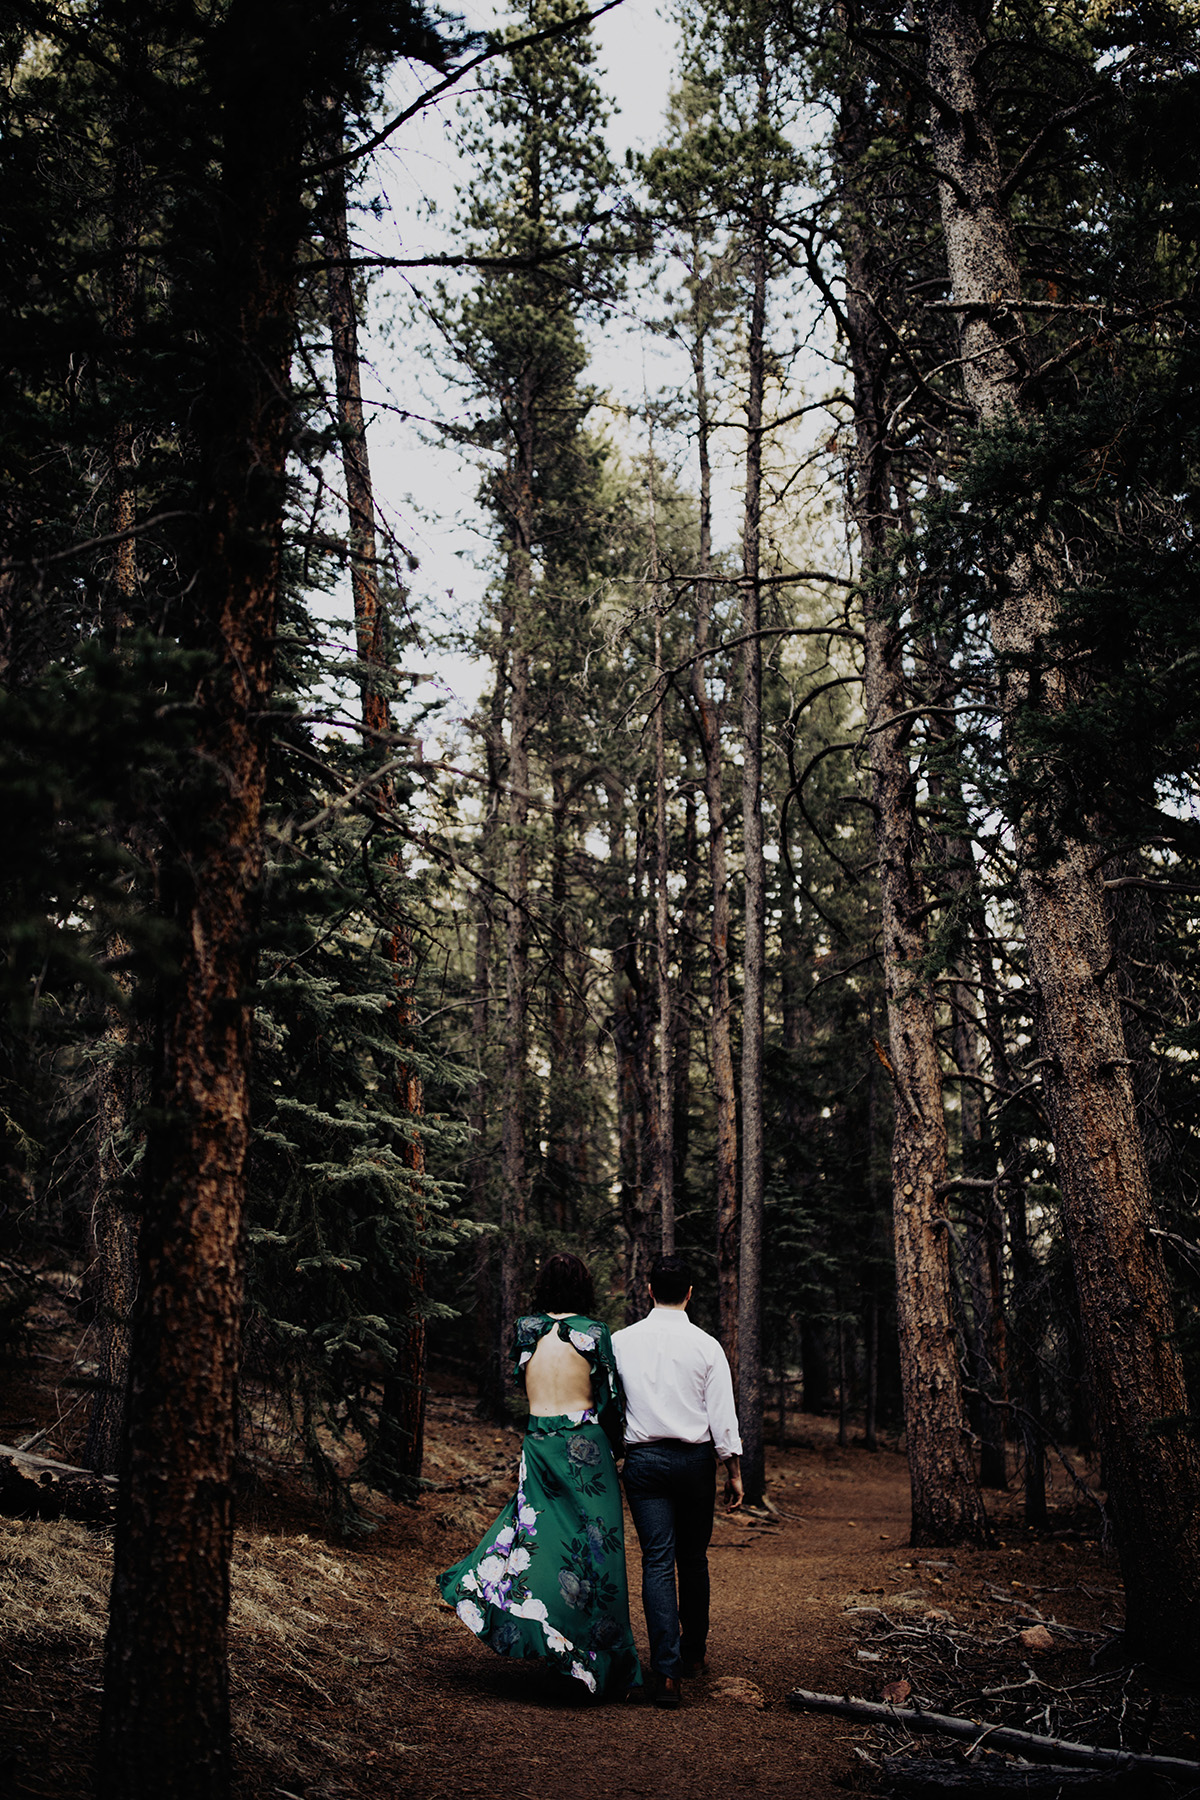 colorado-wedding-photographer-stauton-state-park-engagement-session-Sheena-Jared-001.jpg